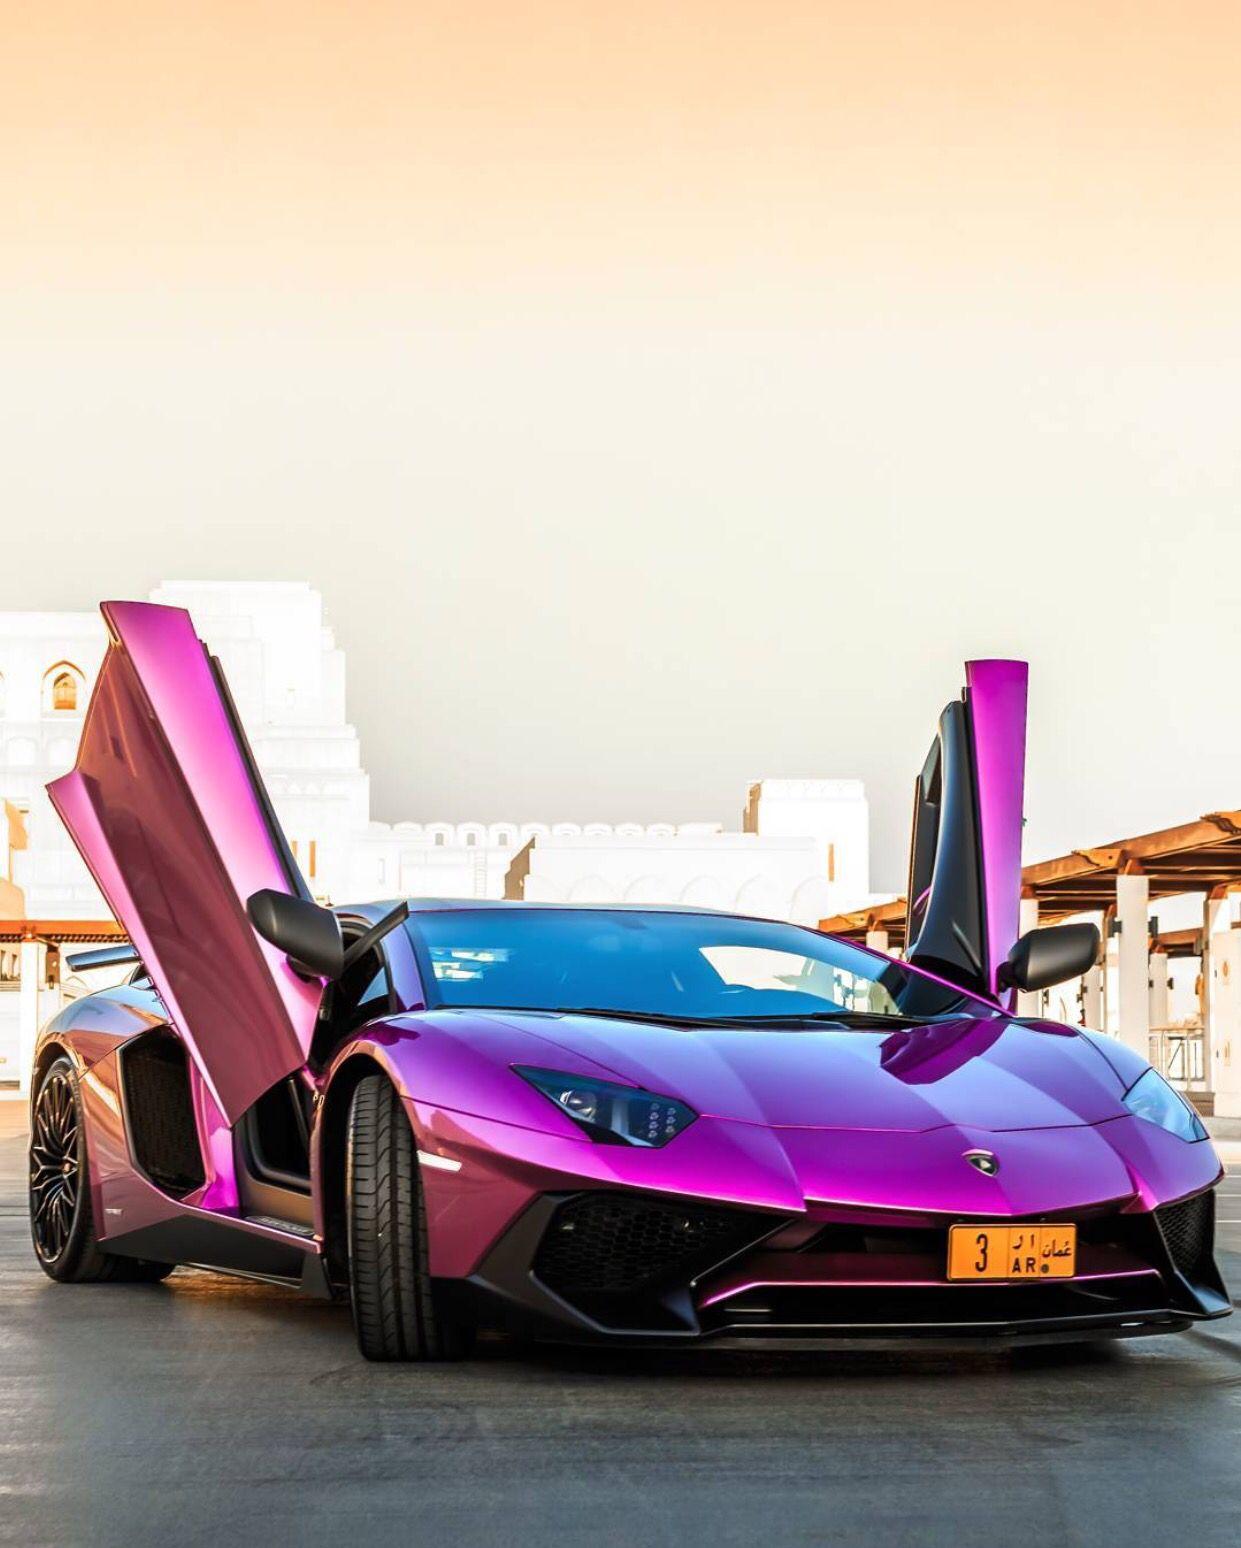 Lamborghini Adventador And Hurican Instagram on